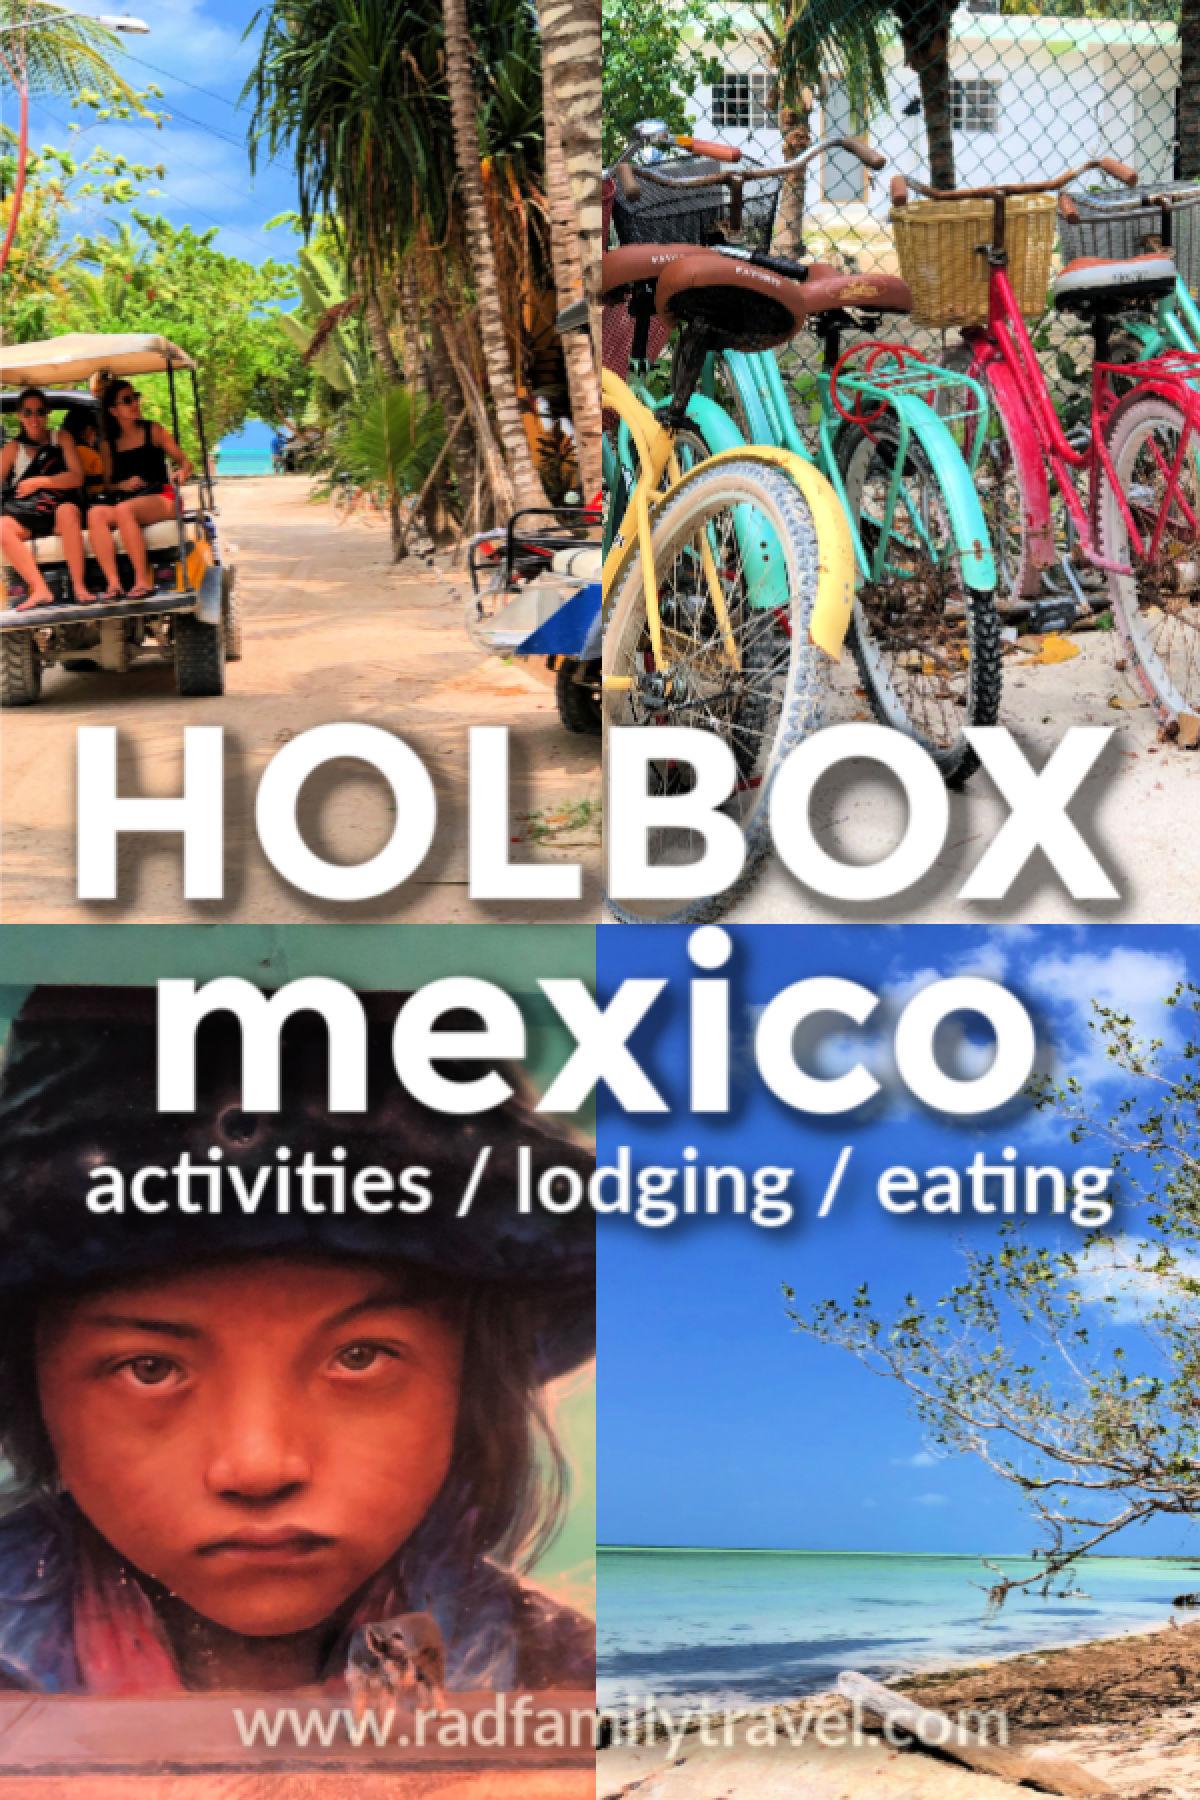 holbox-mexico-pin-6.jpg